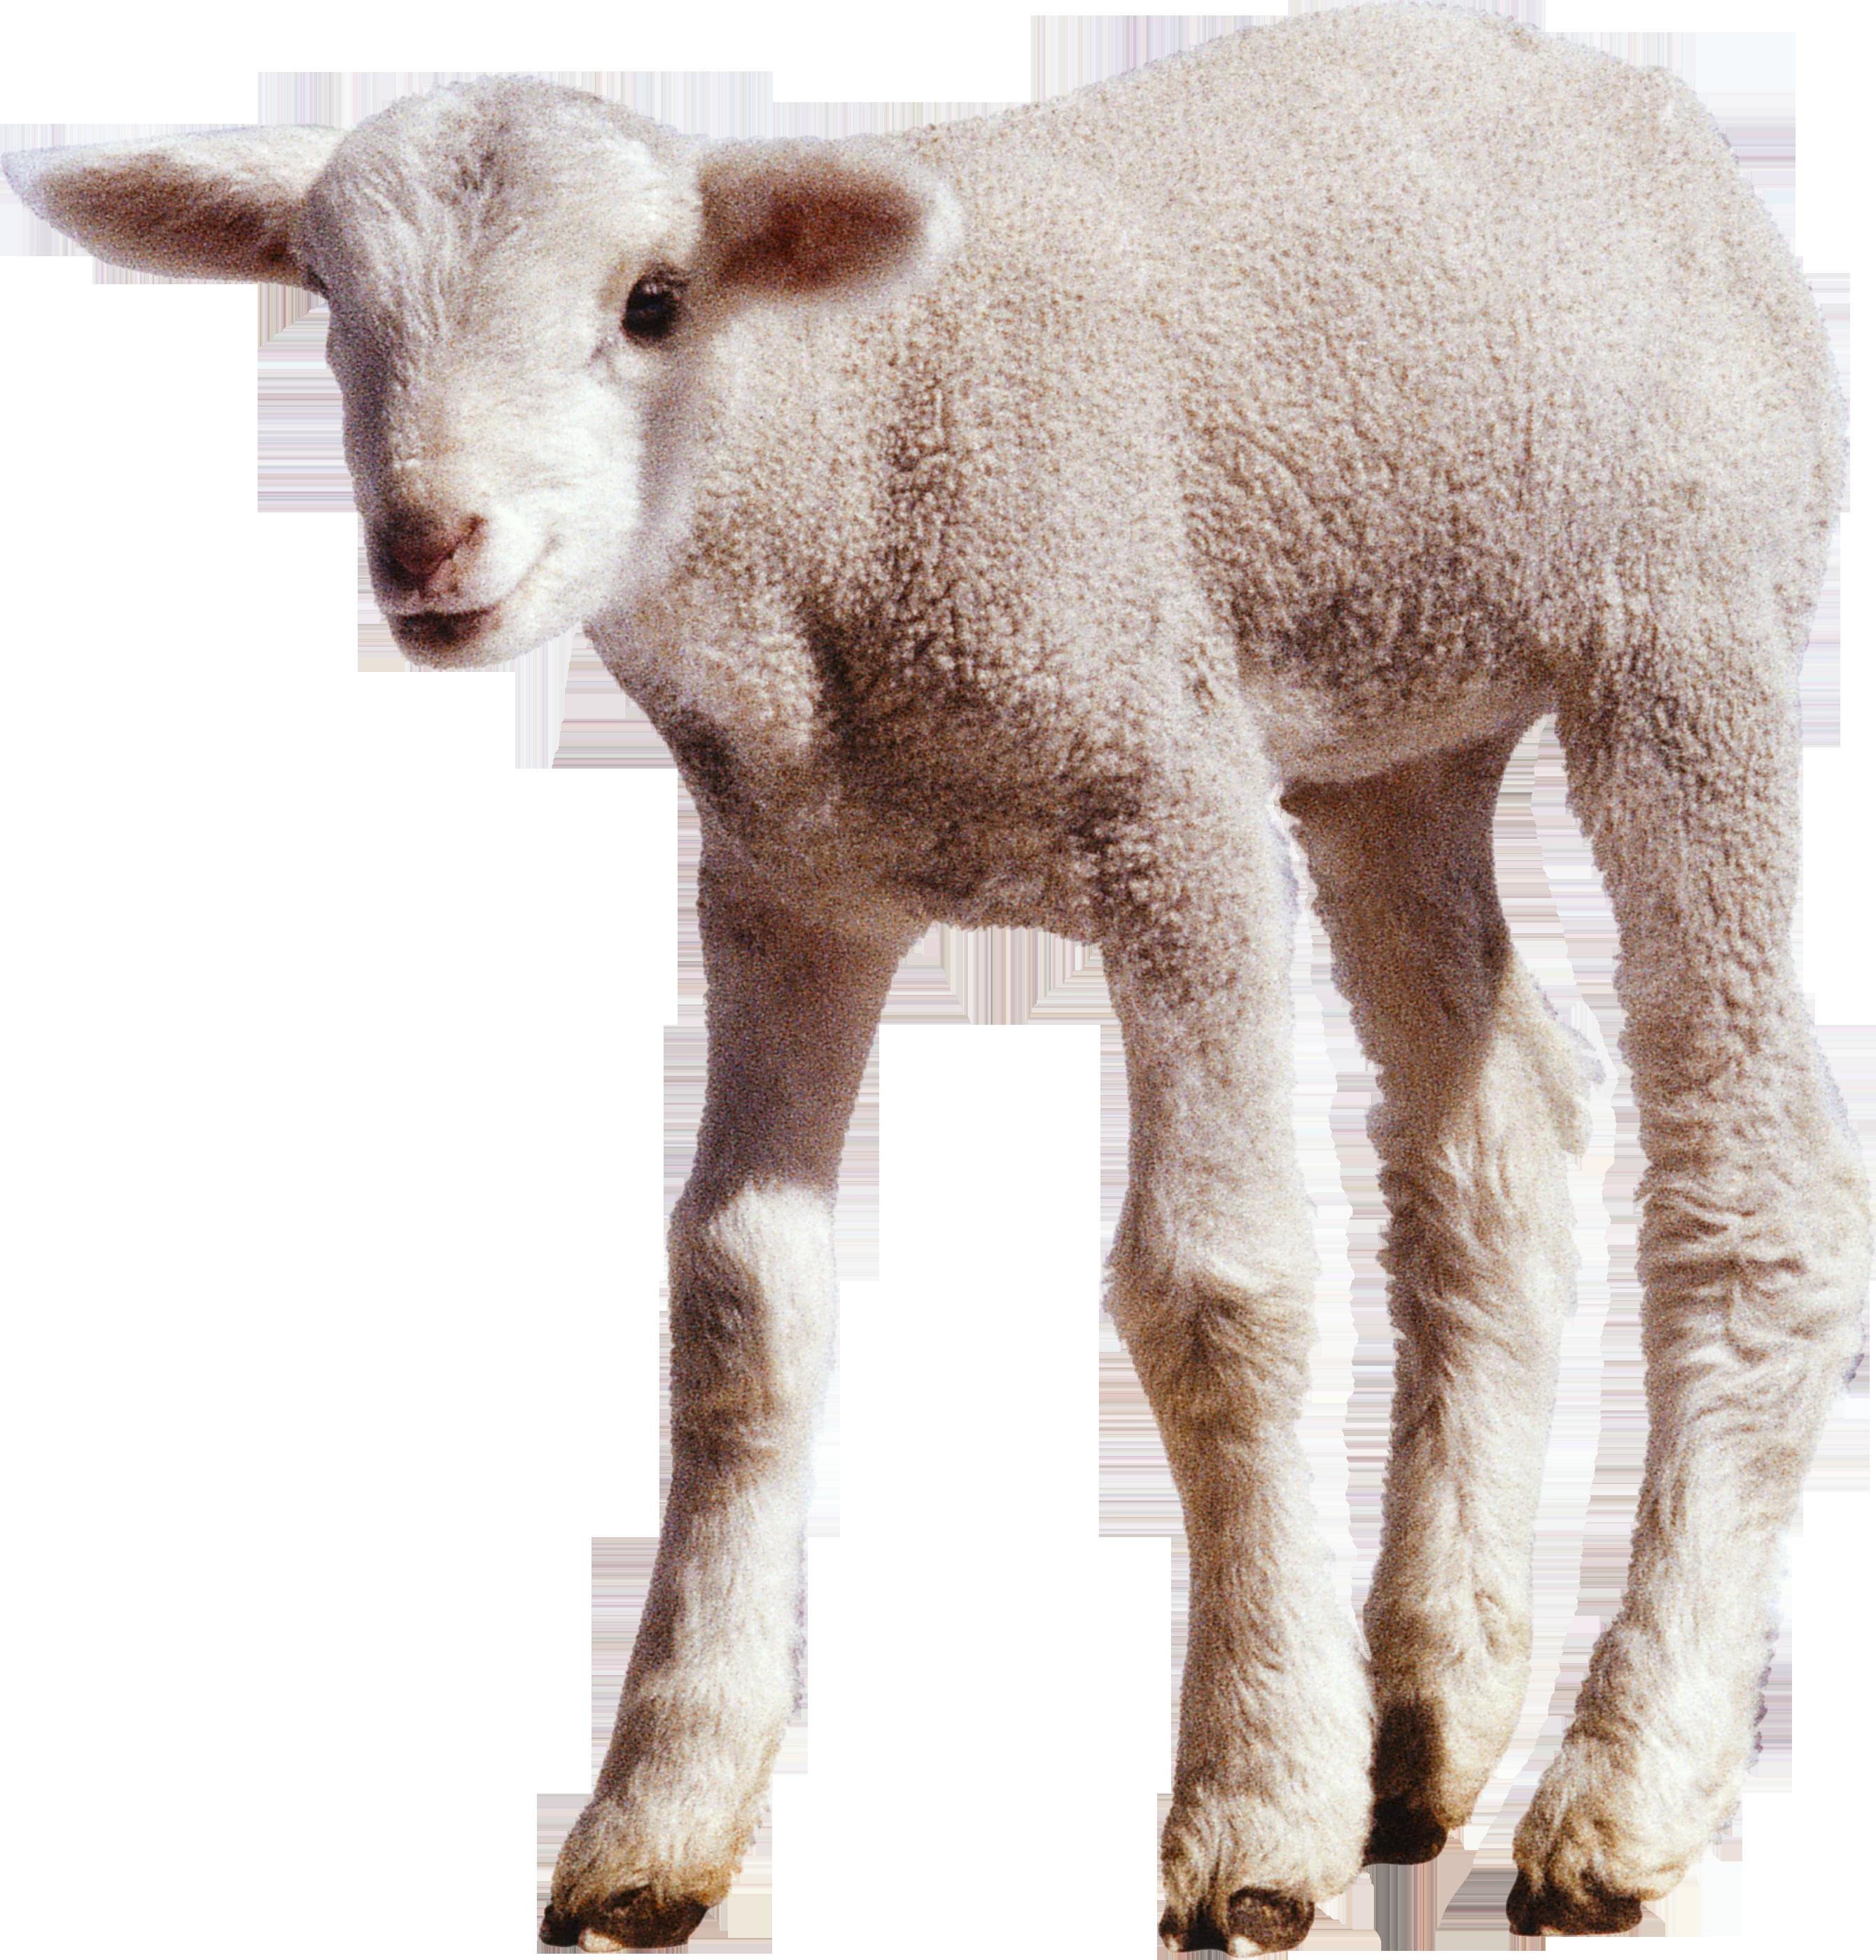 white little sheep PNG image - Baby Lamb PNG - Cute Lamb PNG HD